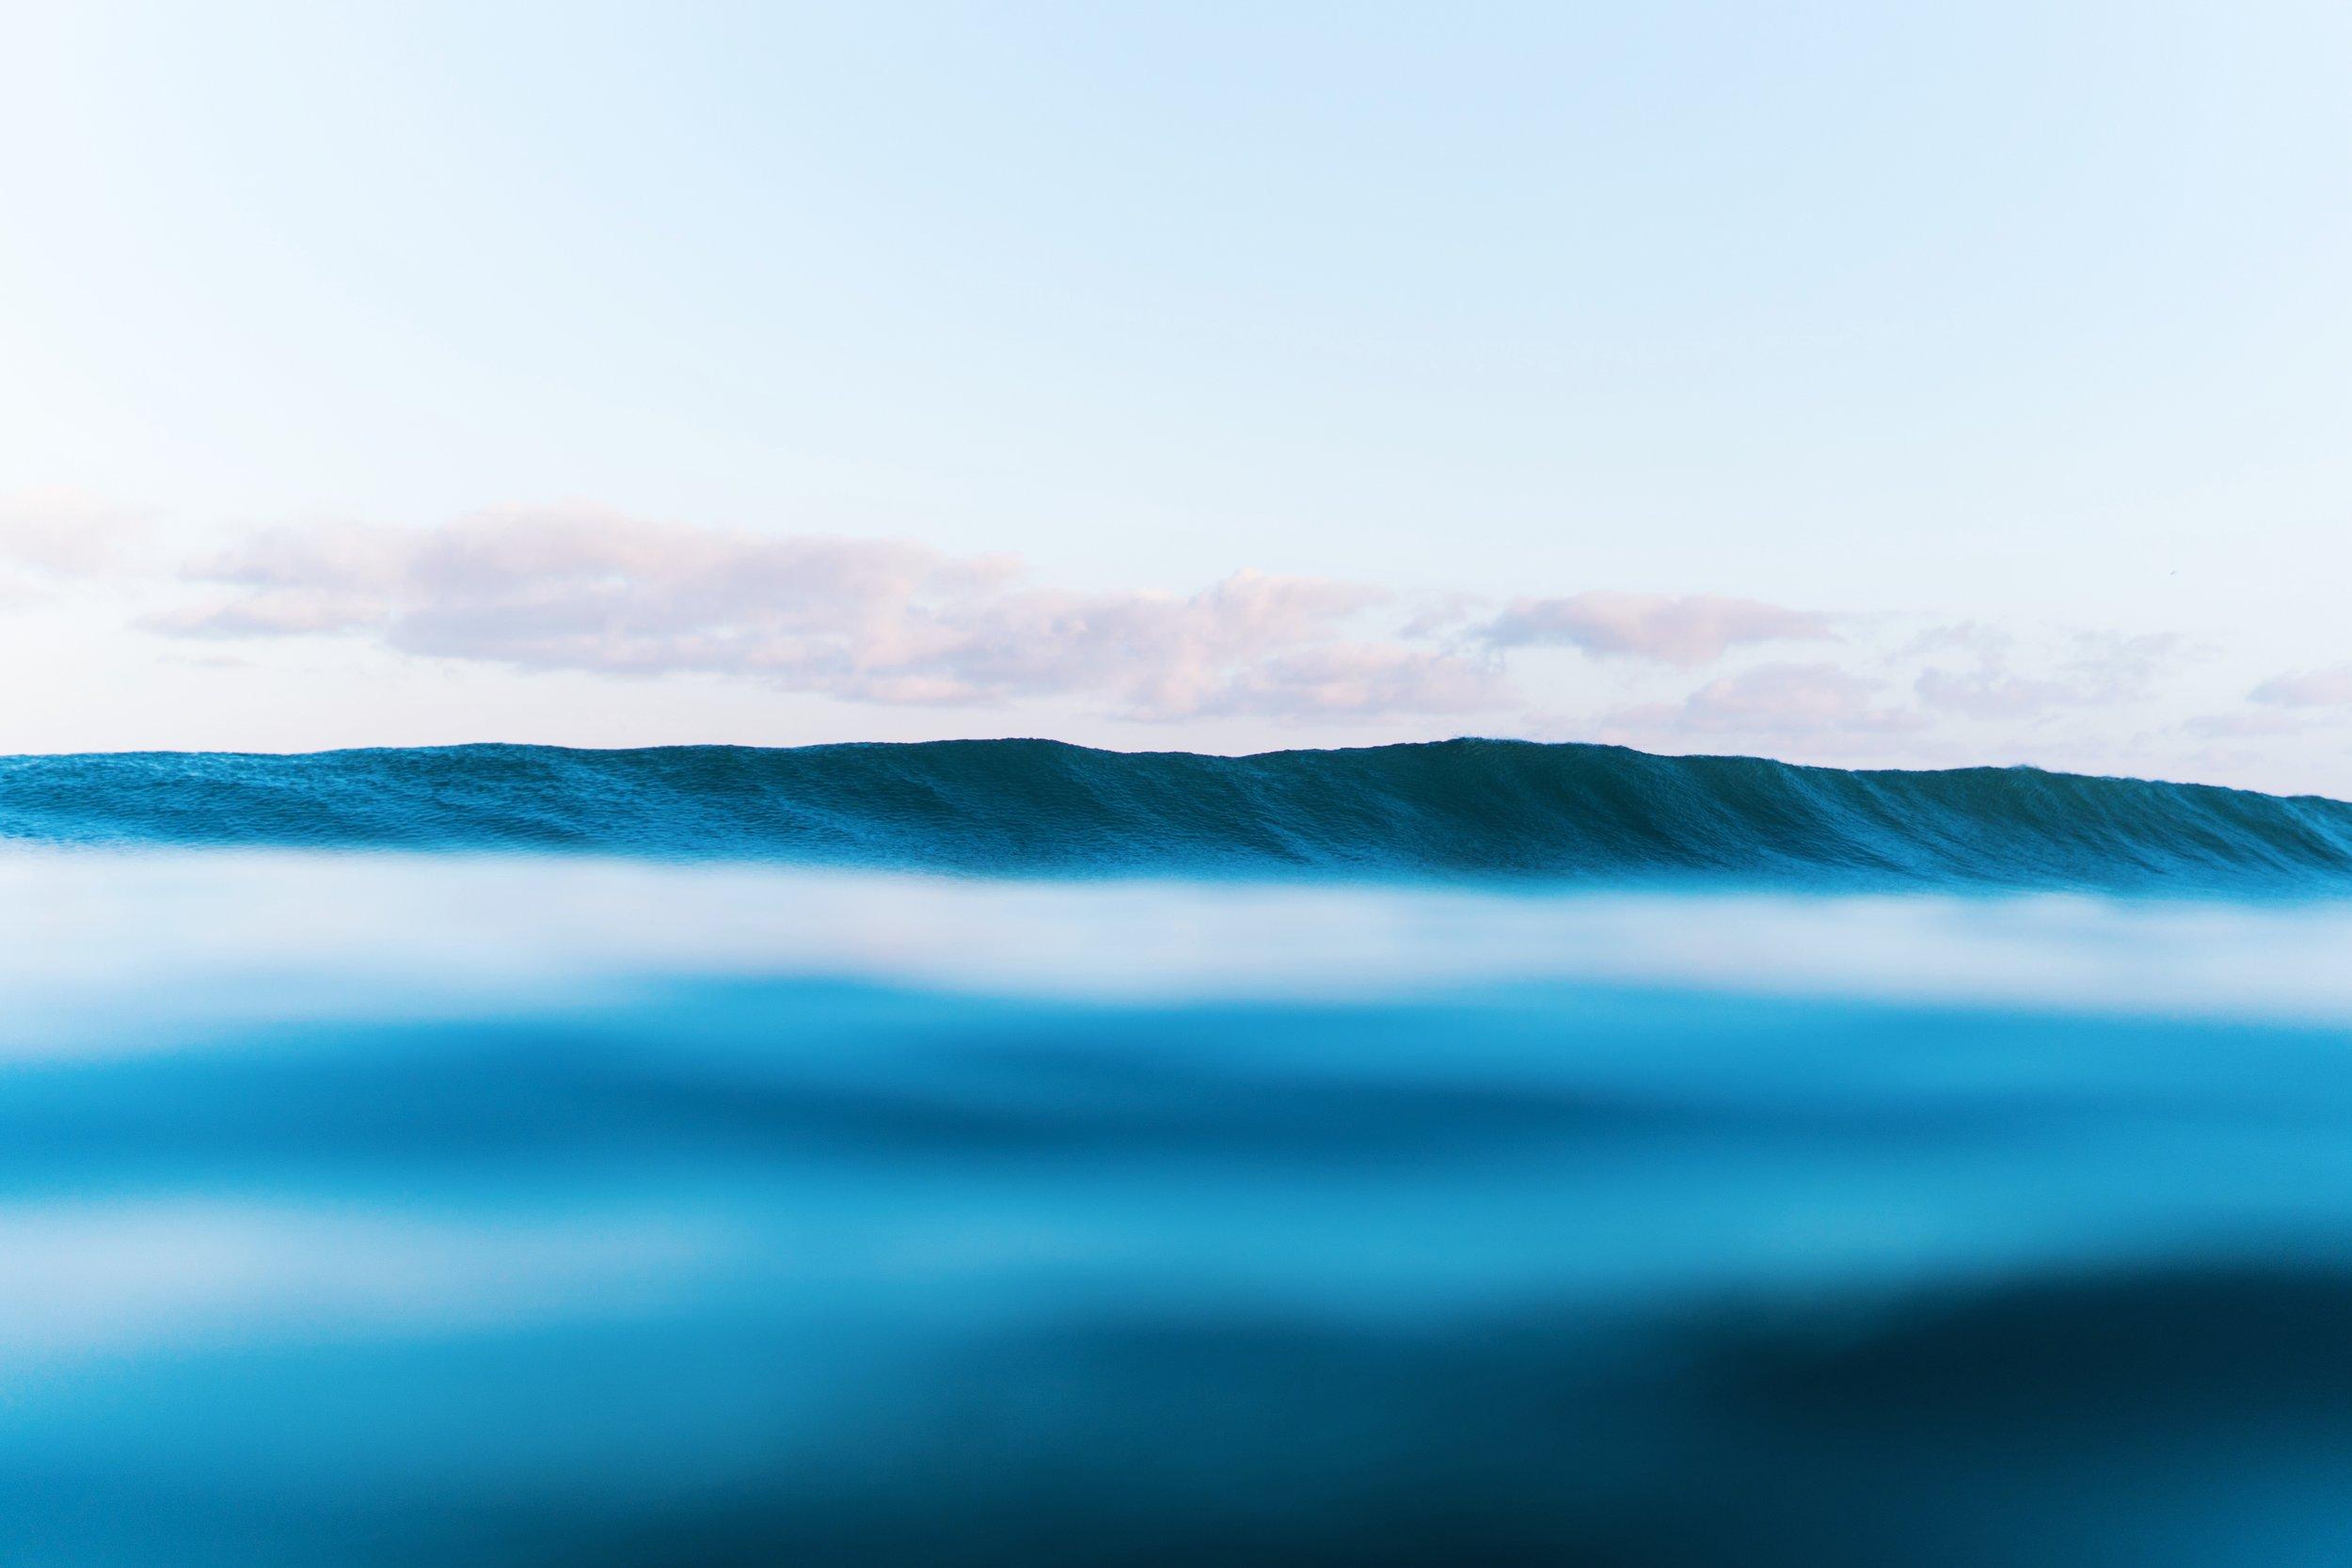 Sayulita-Mexico-Surf-Diego-Cadena-Kalle-Carranza-Dylan-Southworth-Gato-Rodriguez-Julien-Dorian-Gomez-Heiko-Bothe-20.jpg